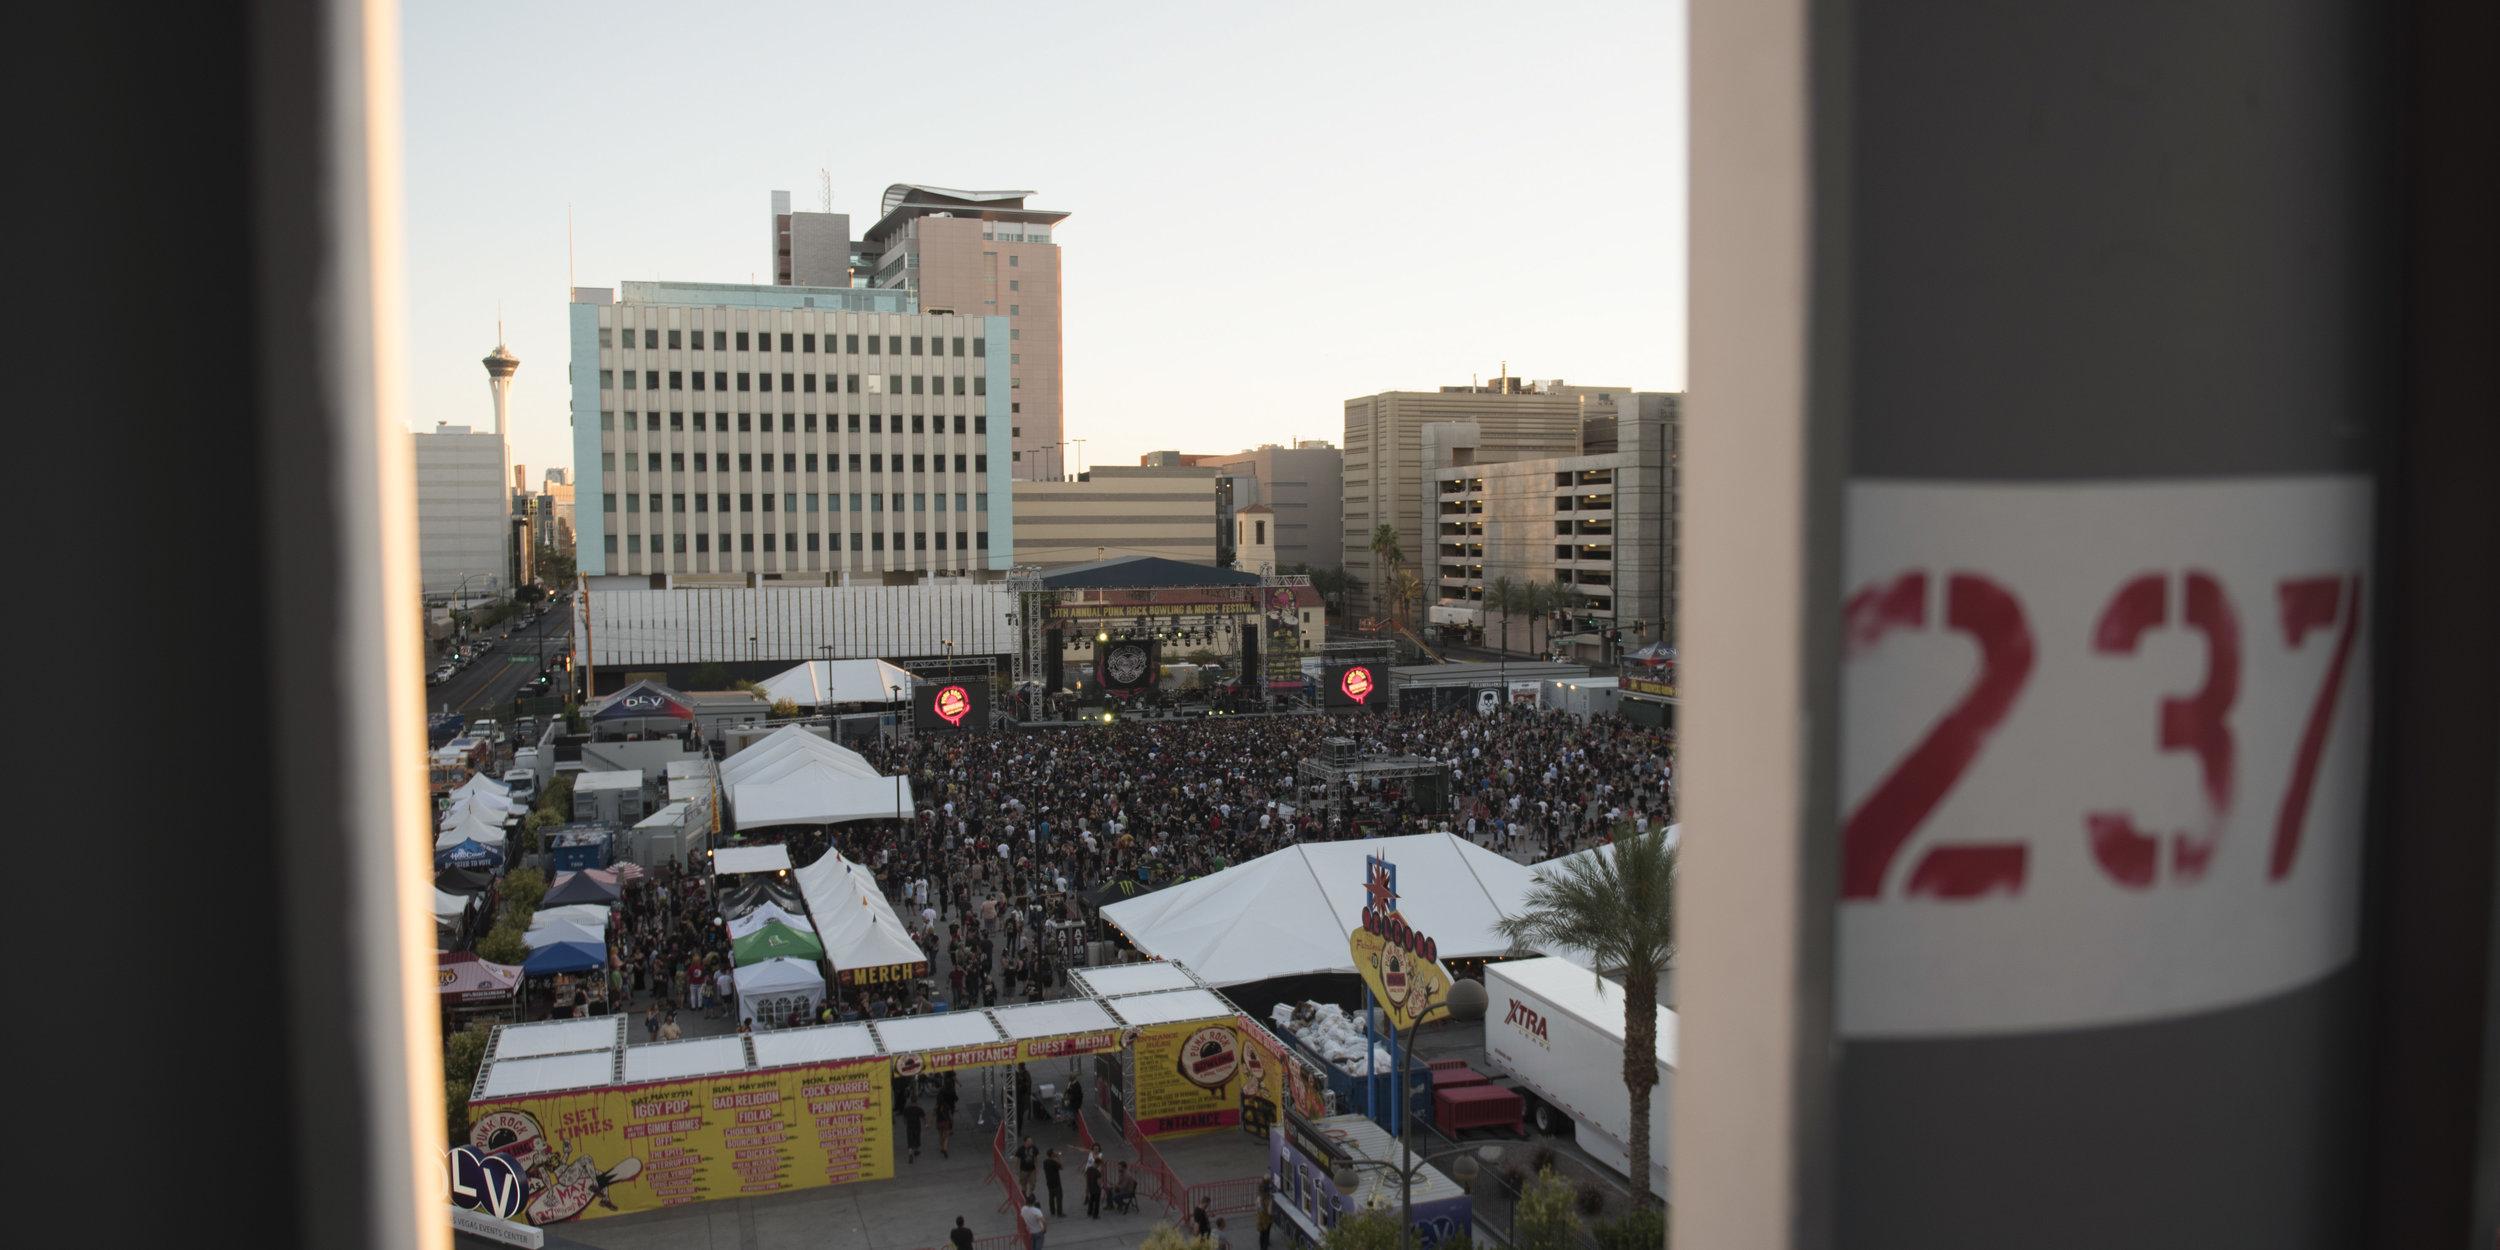 Punk Rock Bowling music festival 2017 in Las Vegas, Nev..